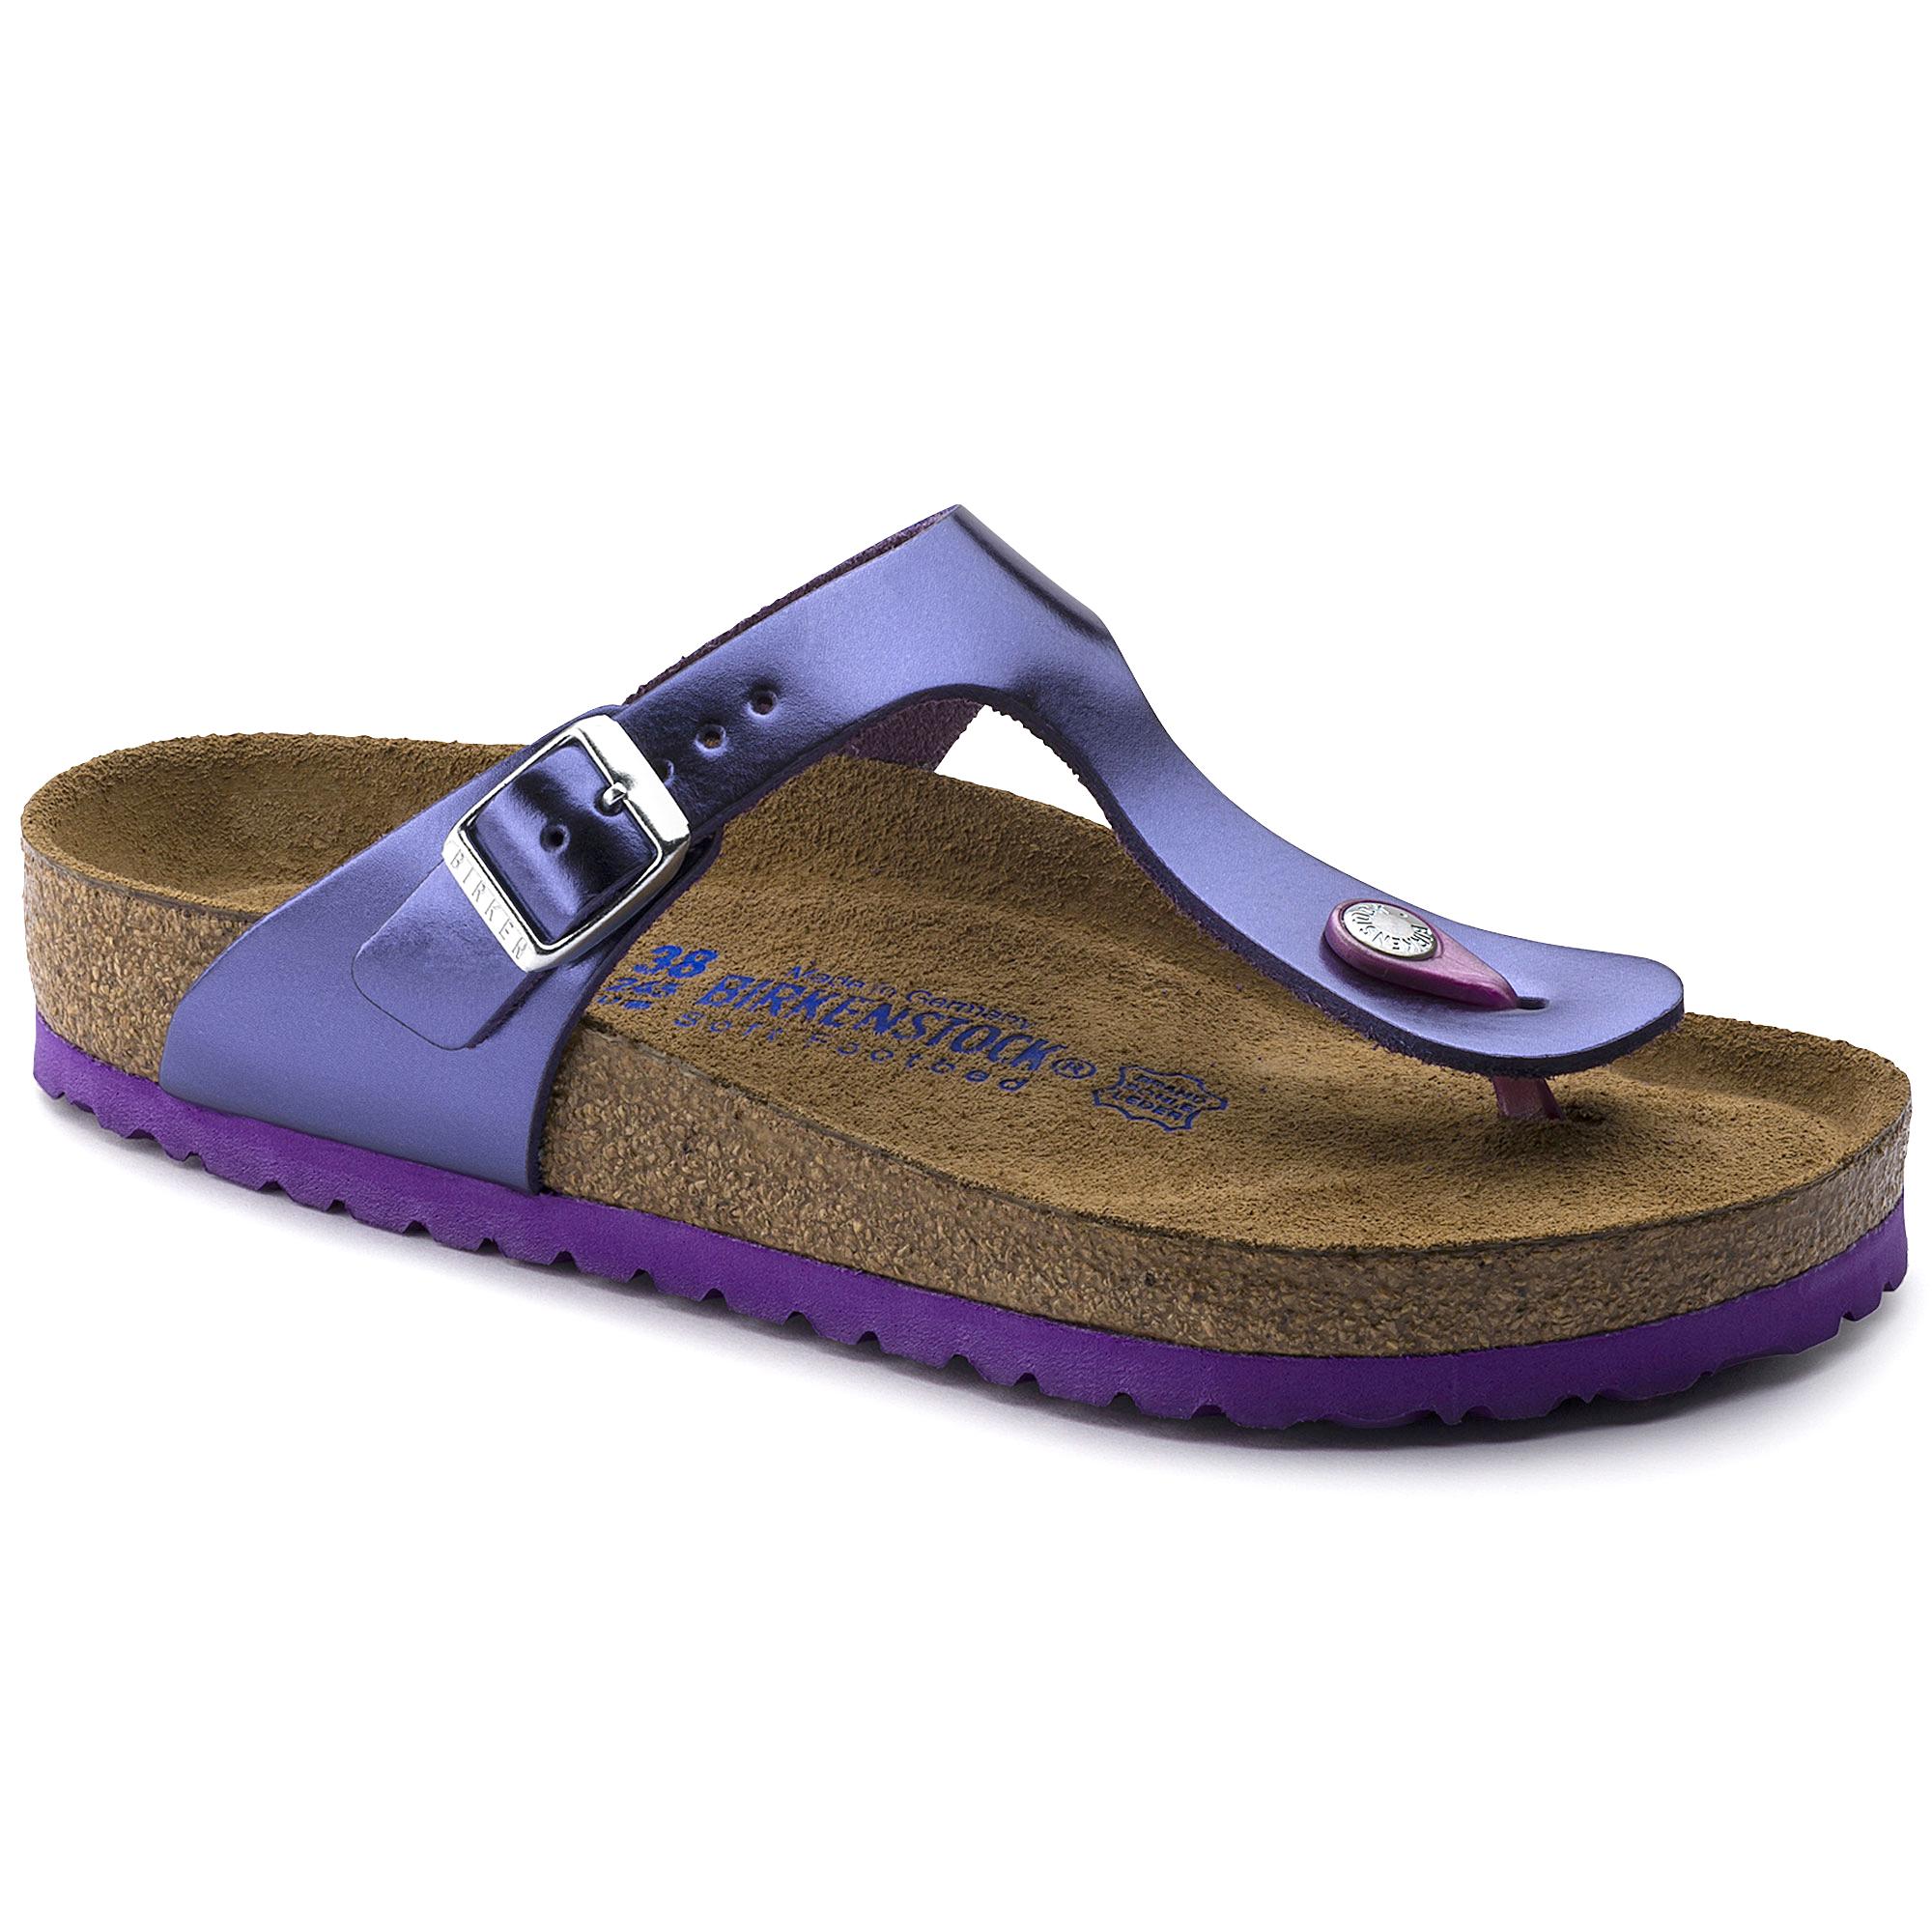 Gizeh Natural Leather Metallic Violet ... ea936b4318f